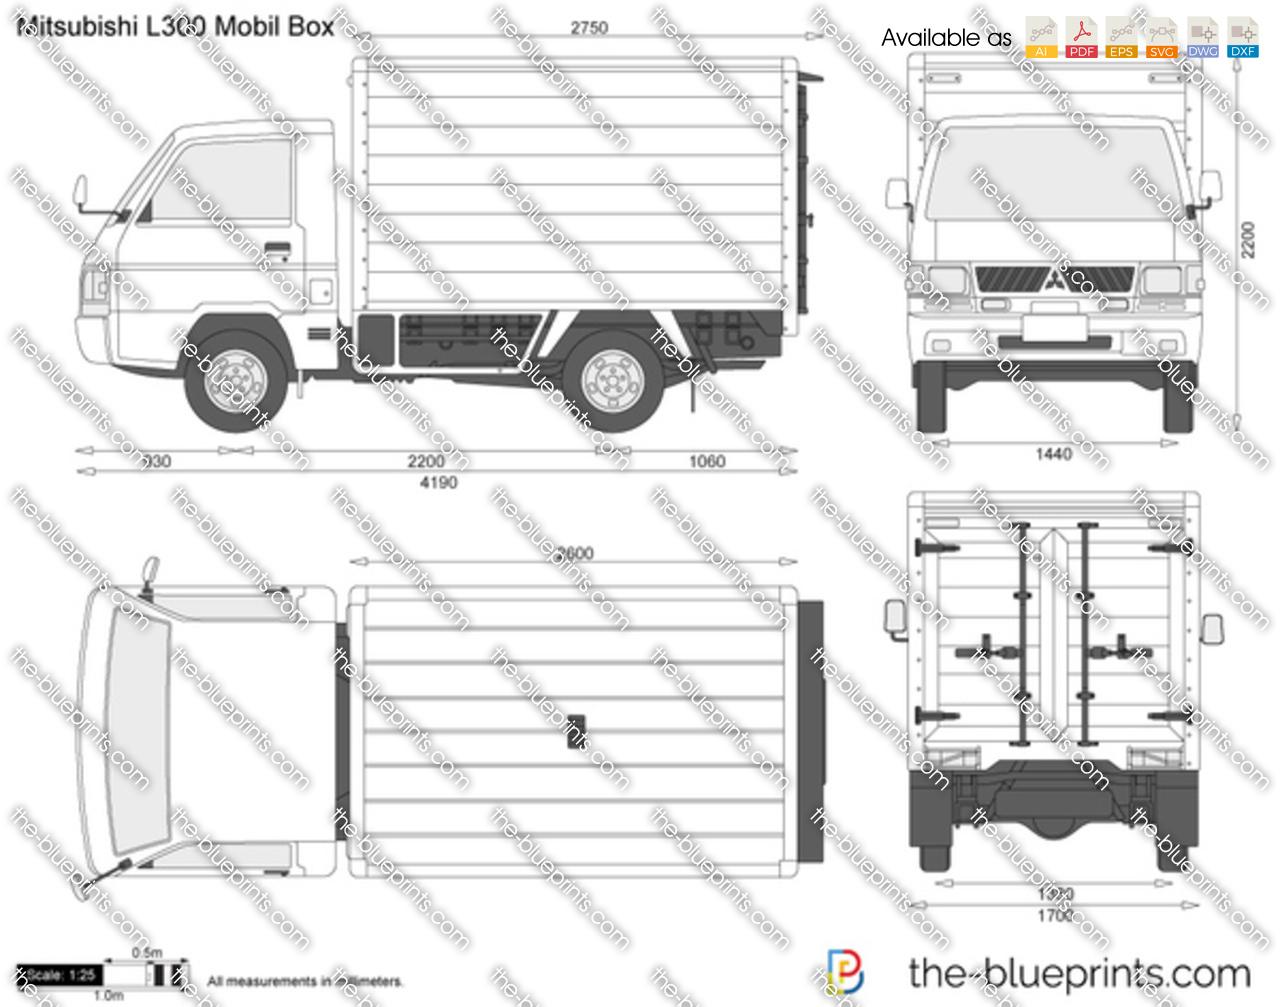 Mitsubishi L300 Mobil Box 1993